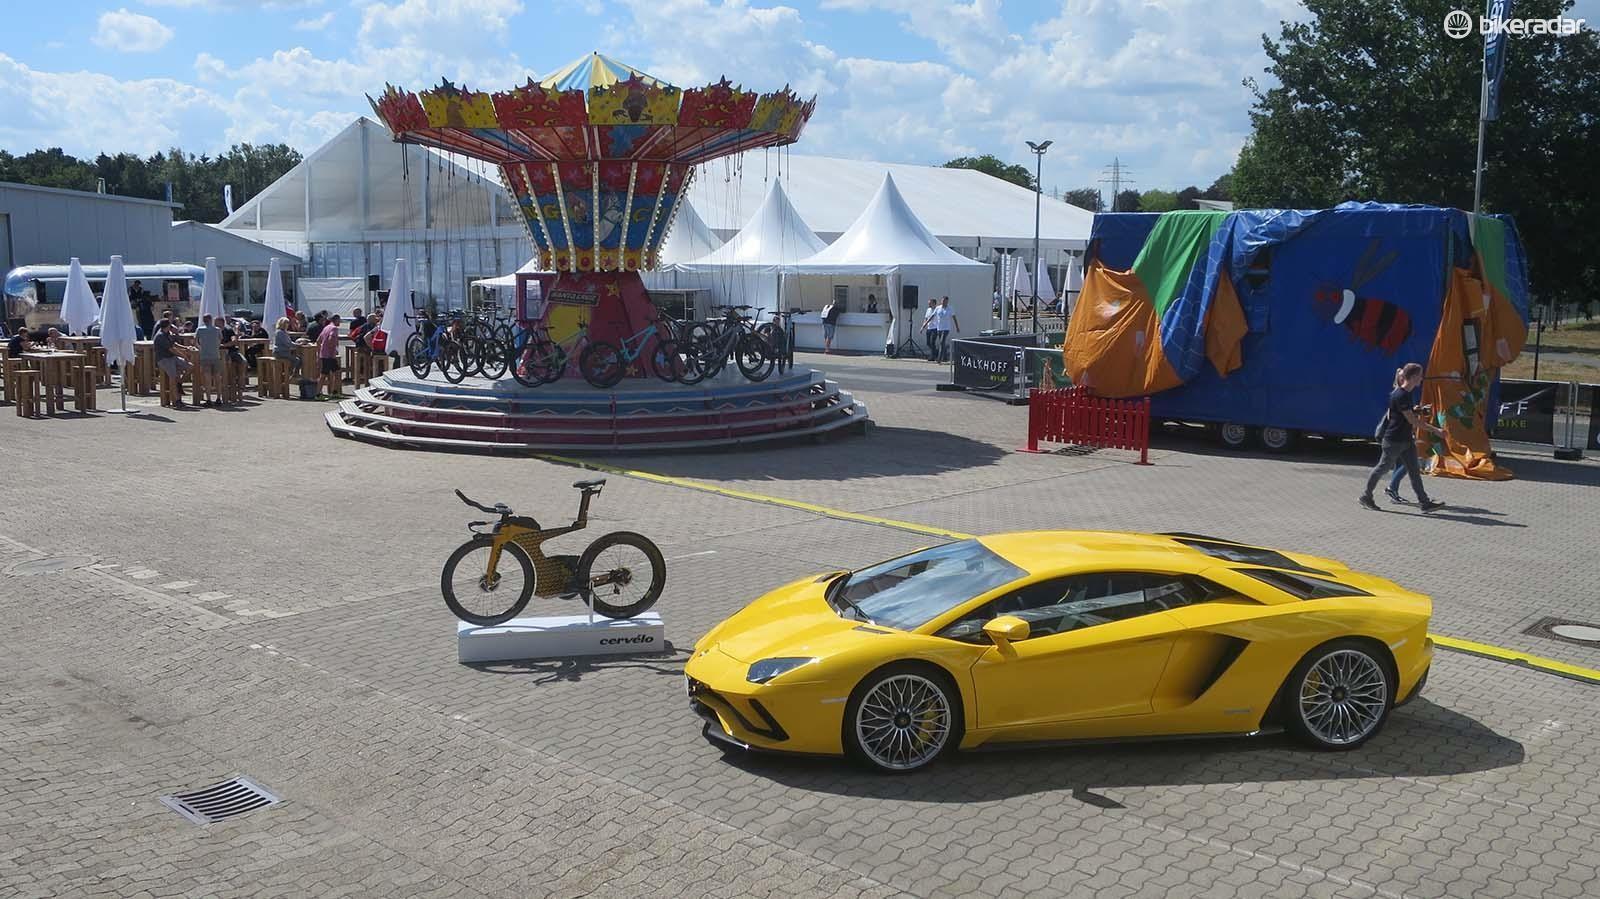 It's not often you see a Lamborghini Aventador at a bike show